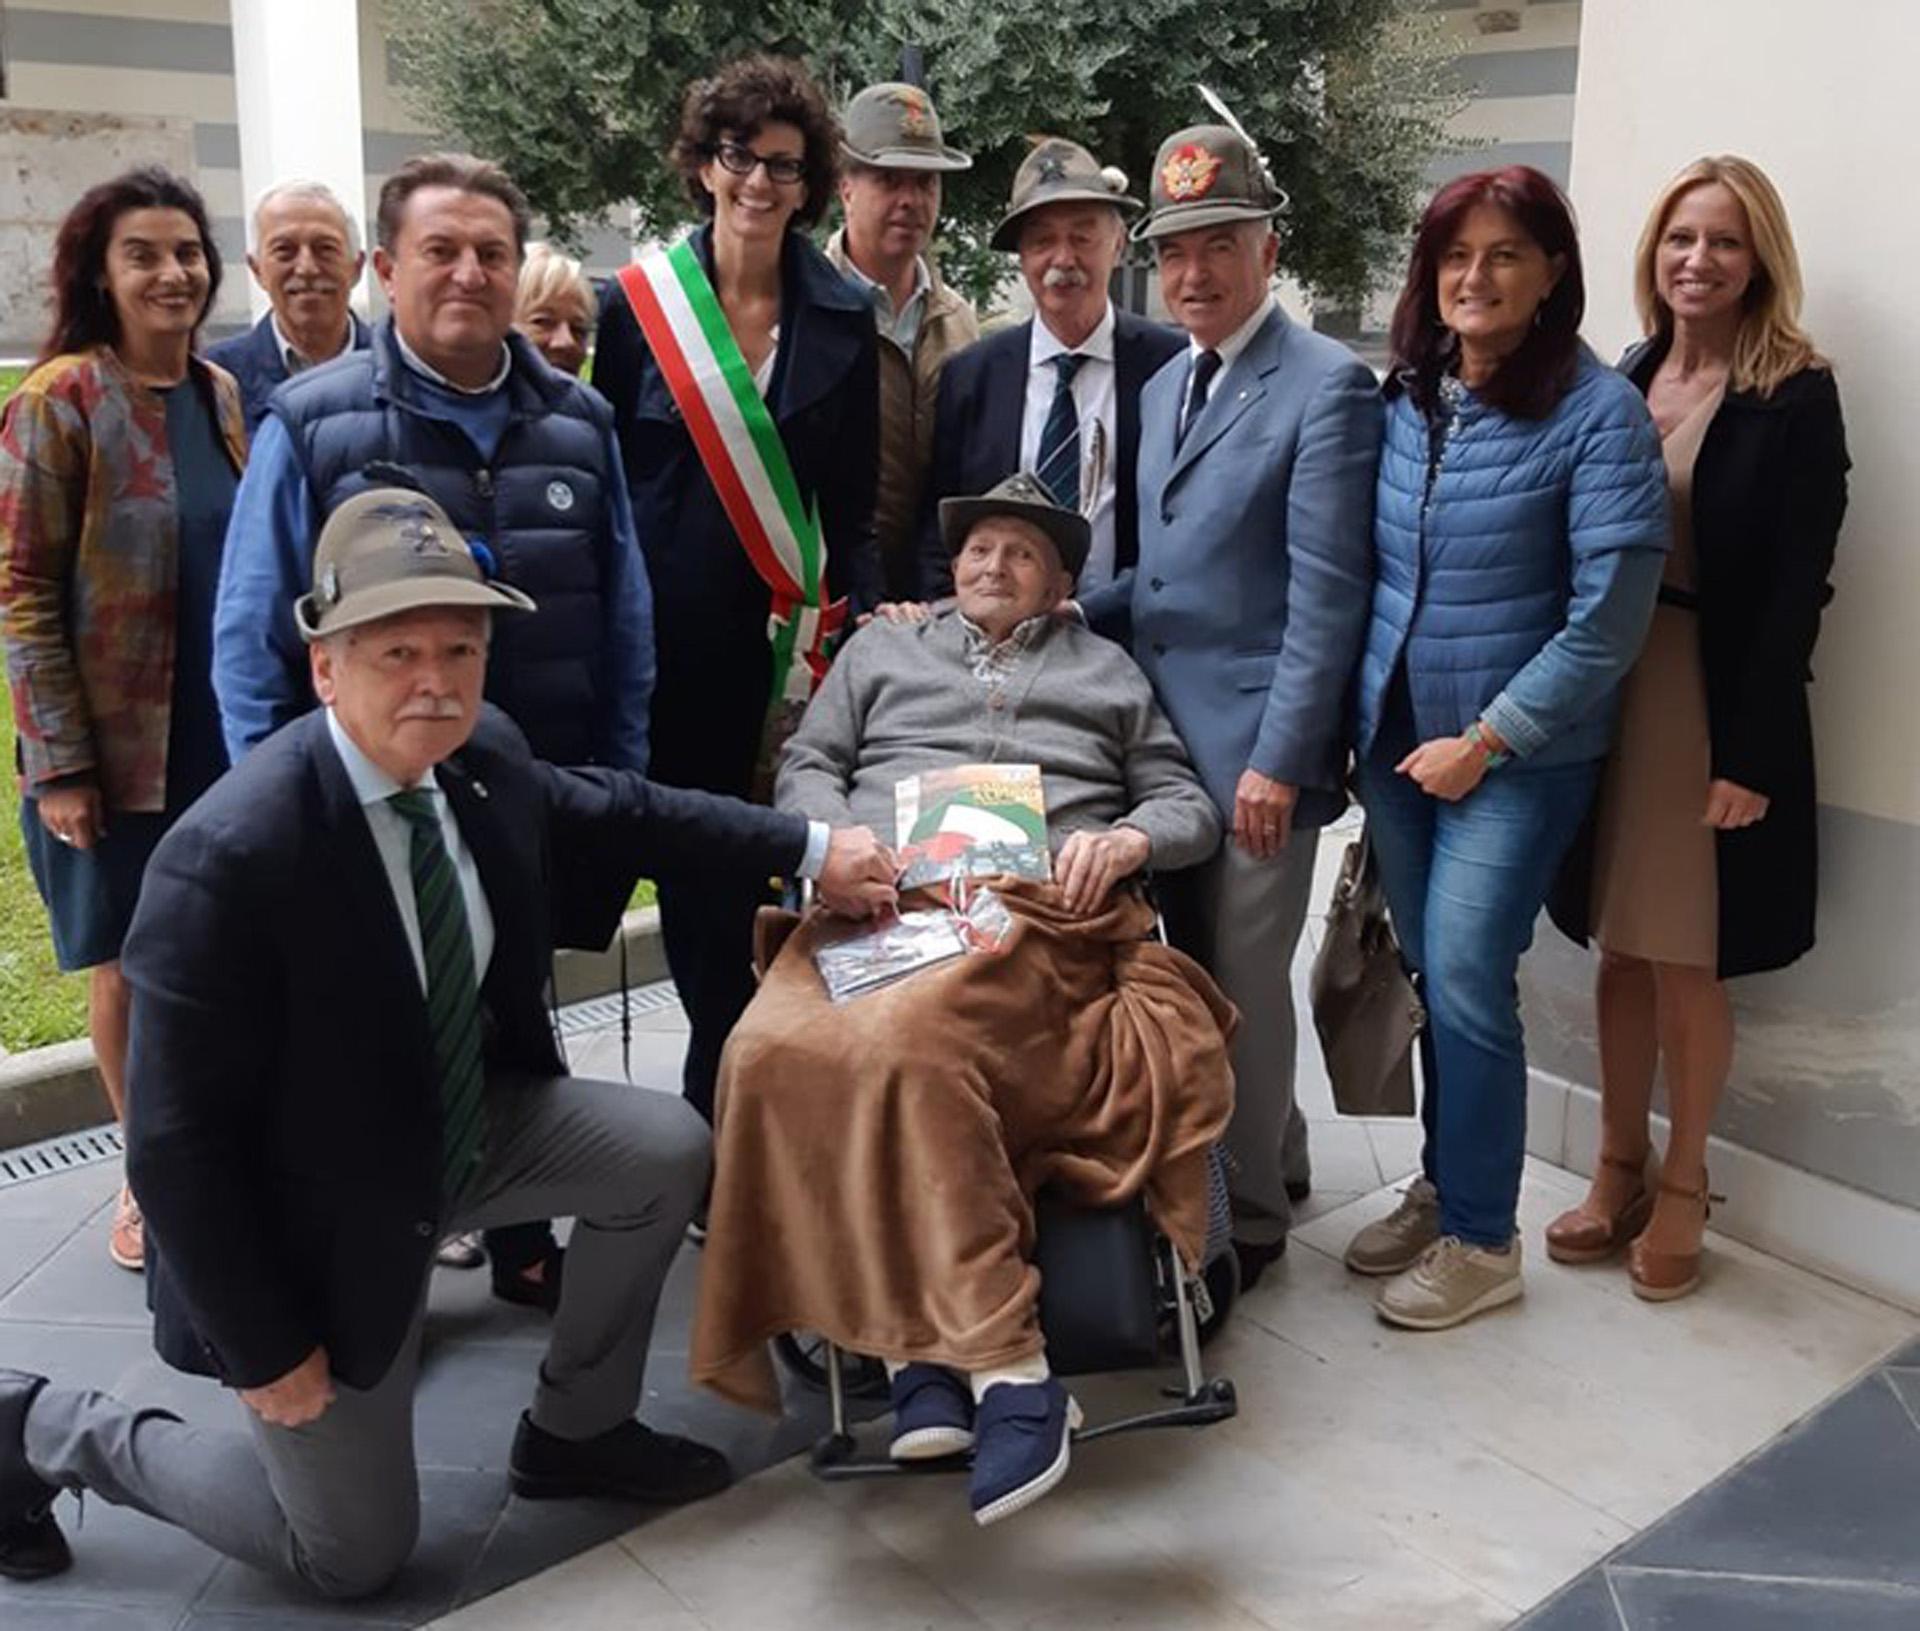 Egidio Alpicrovi Residenza Protetta Bagnasco - Opere Sociali Servizi Savona